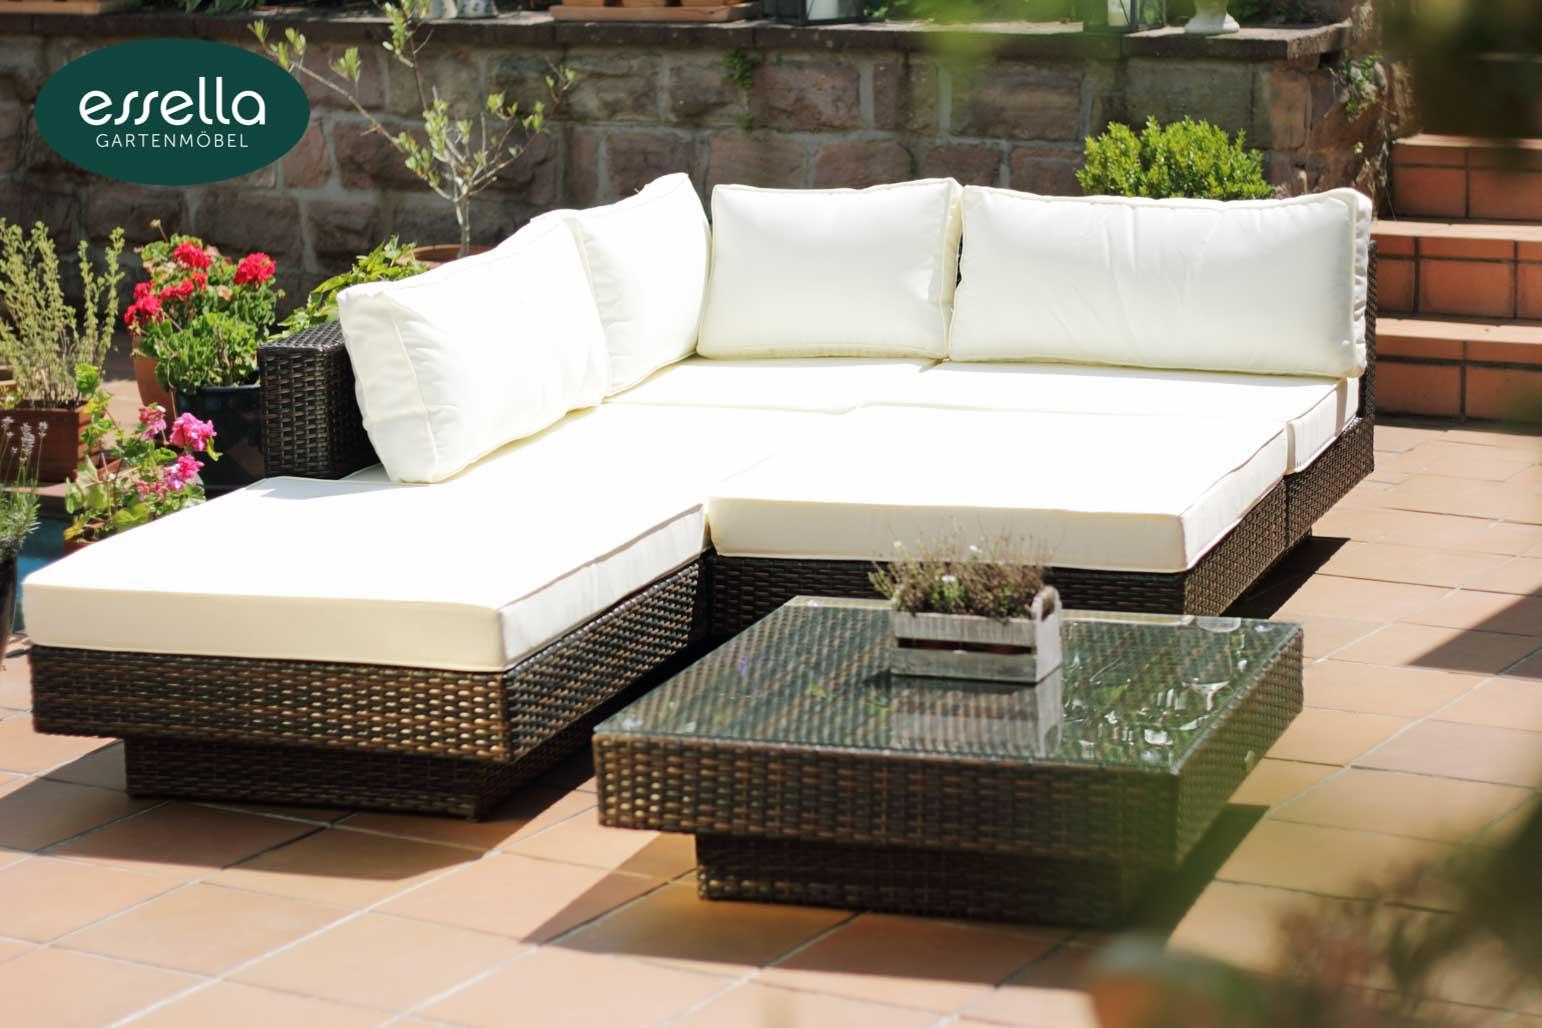 vorschau essella polyrattan lounge melbourne bicolor braun flachgeflecht. Black Bedroom Furniture Sets. Home Design Ideas